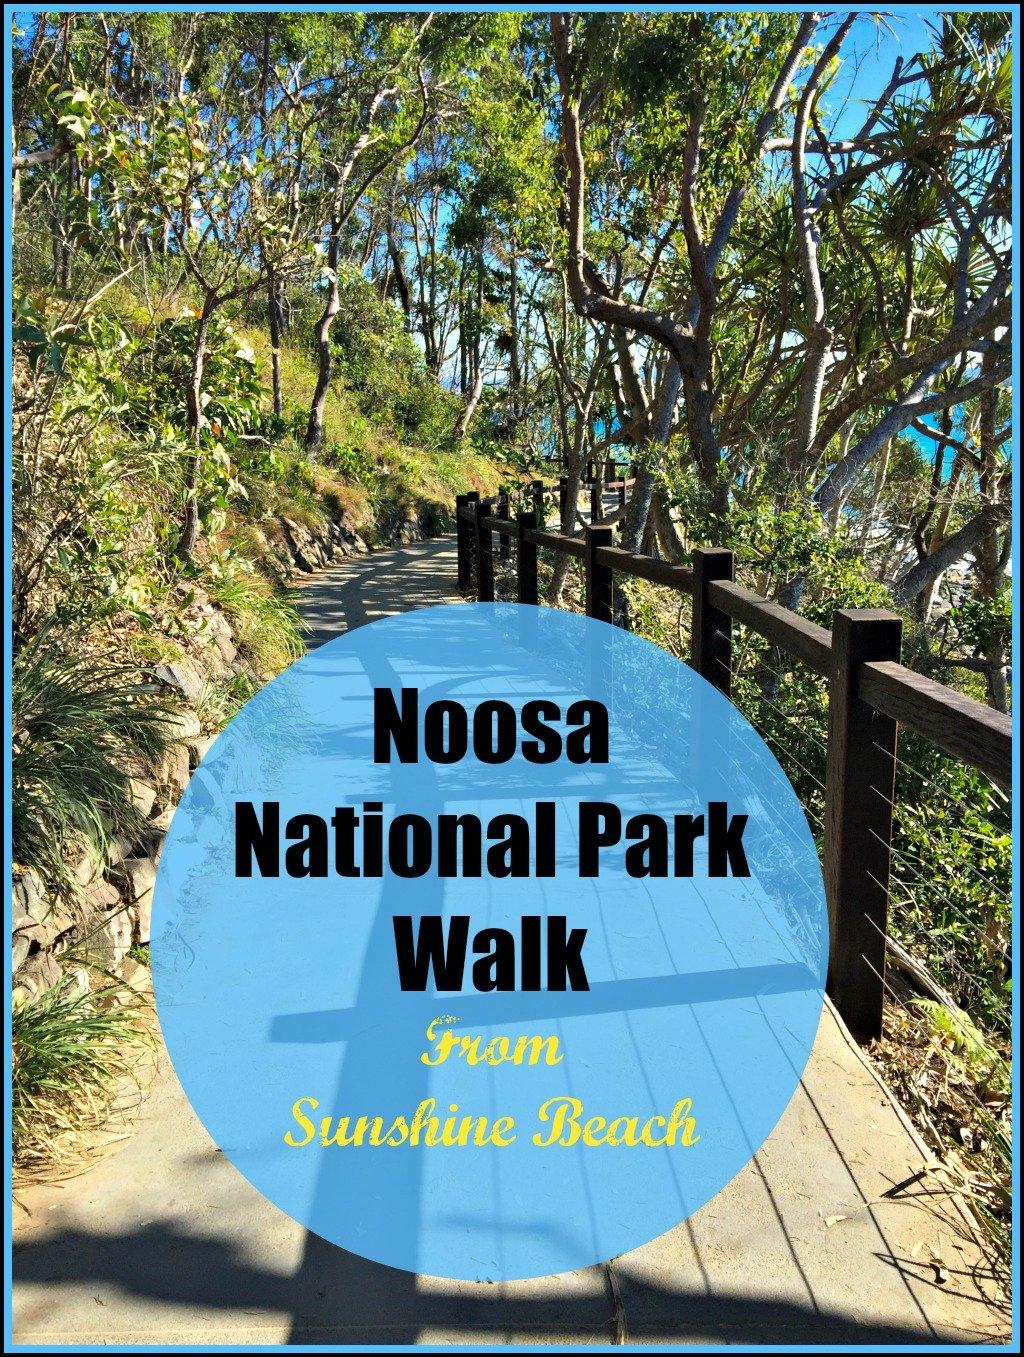 Noosa National Park from Sunshine Beach